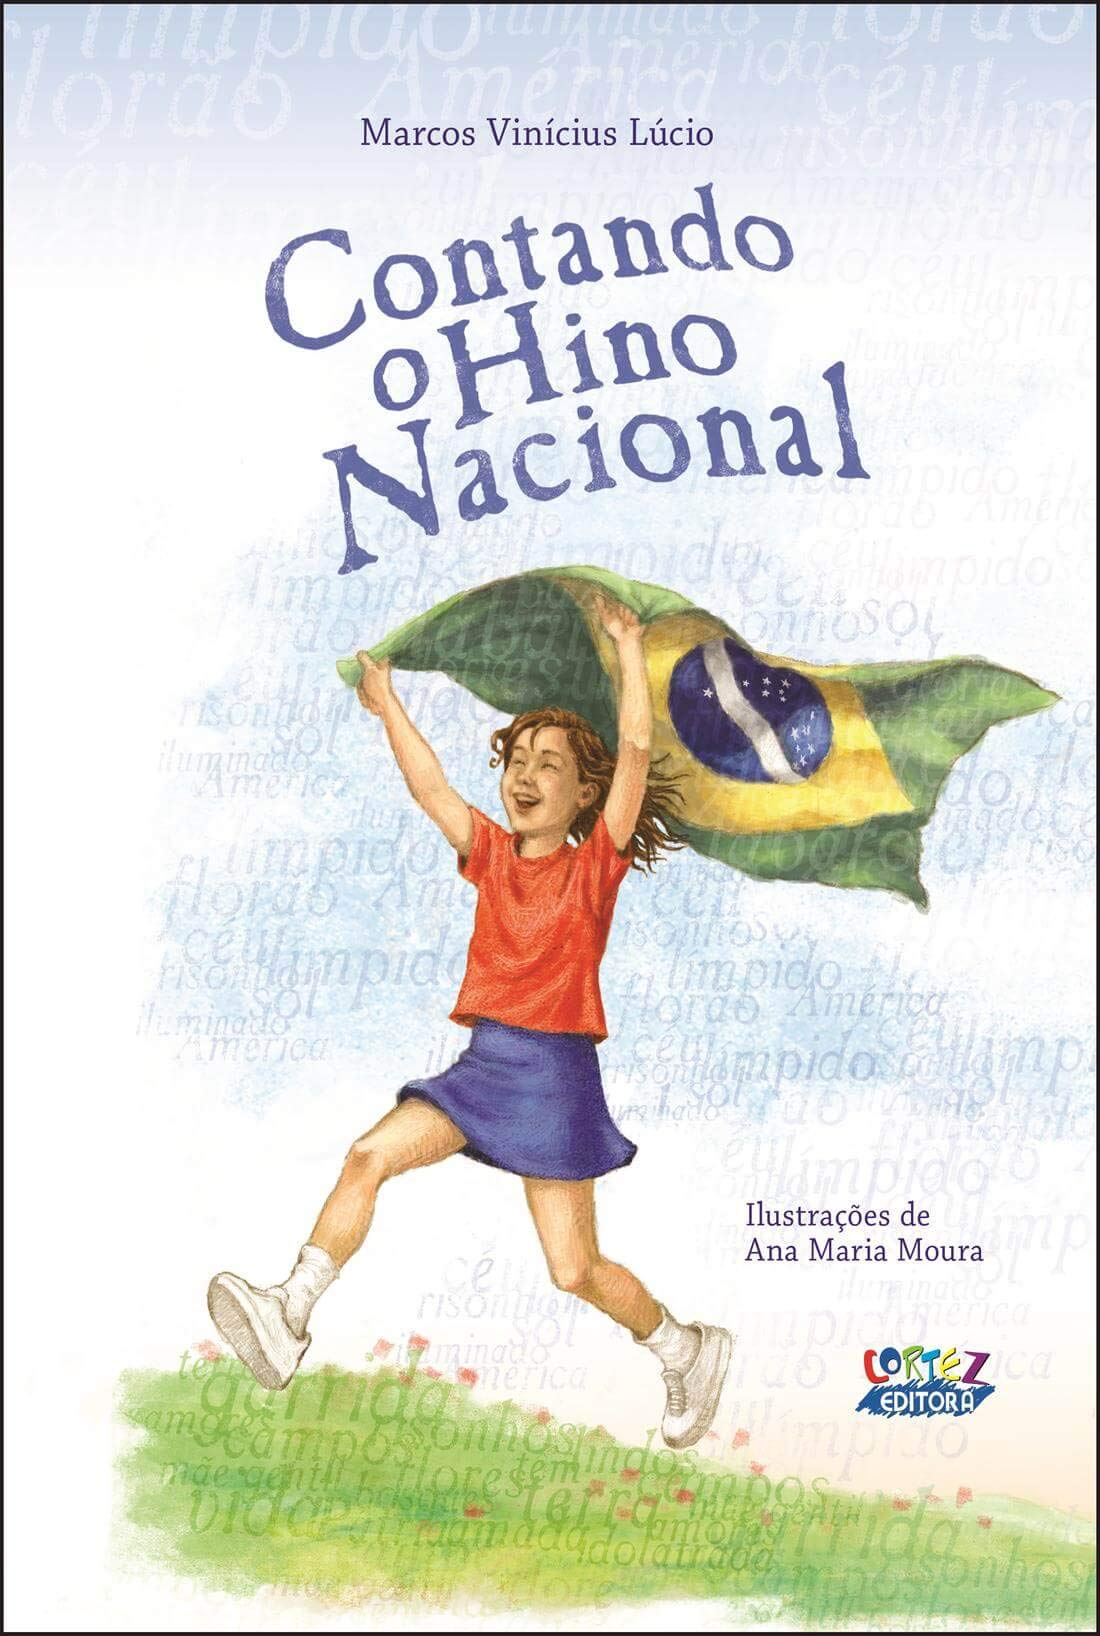 contando o hino nacional ana maria moura 9788524915314 amazon comcontando o hino nacional (portuguese brazilian) paperback \u2013 2009